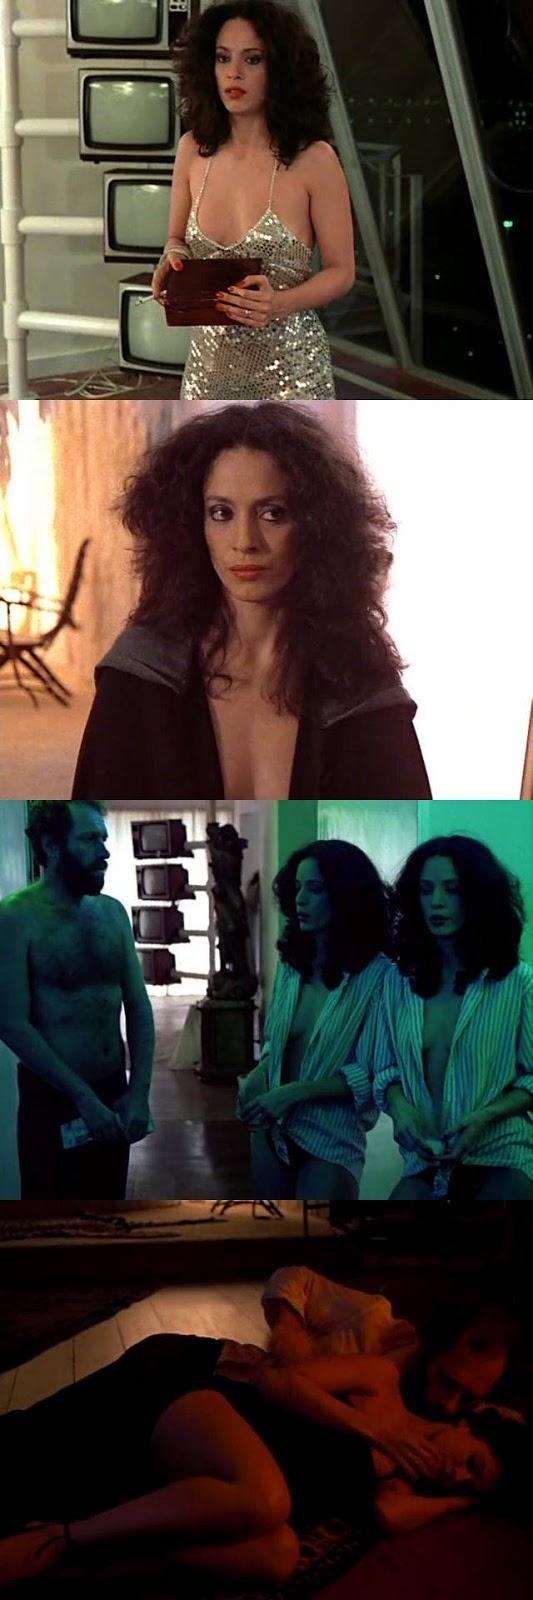 Megapost de Películas Eróticas para Adultos 720p HD Parte 1